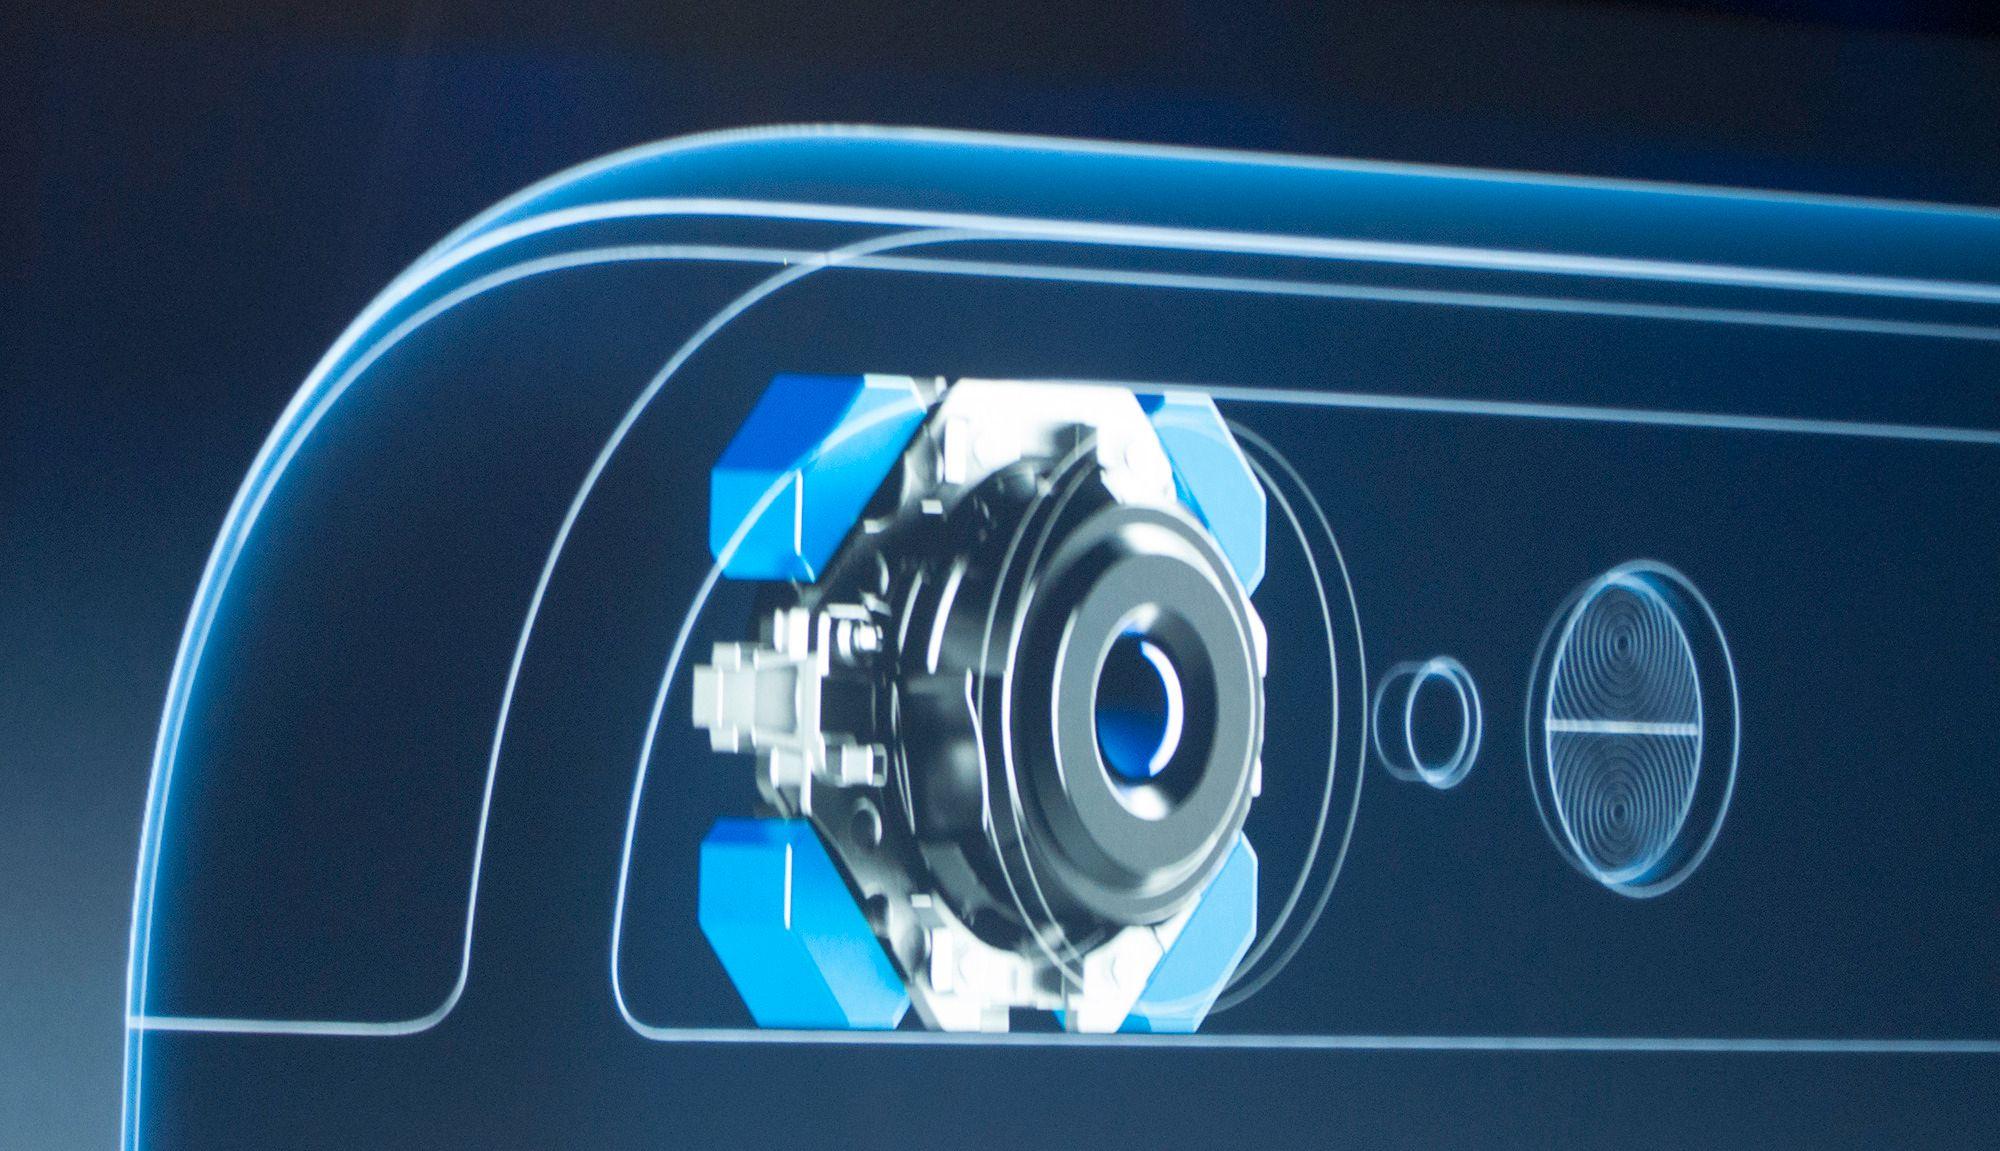 iPhone 6 Plus har optisk bildestabilisator.Foto: Finn Jarle Kvalheim, Tek.no